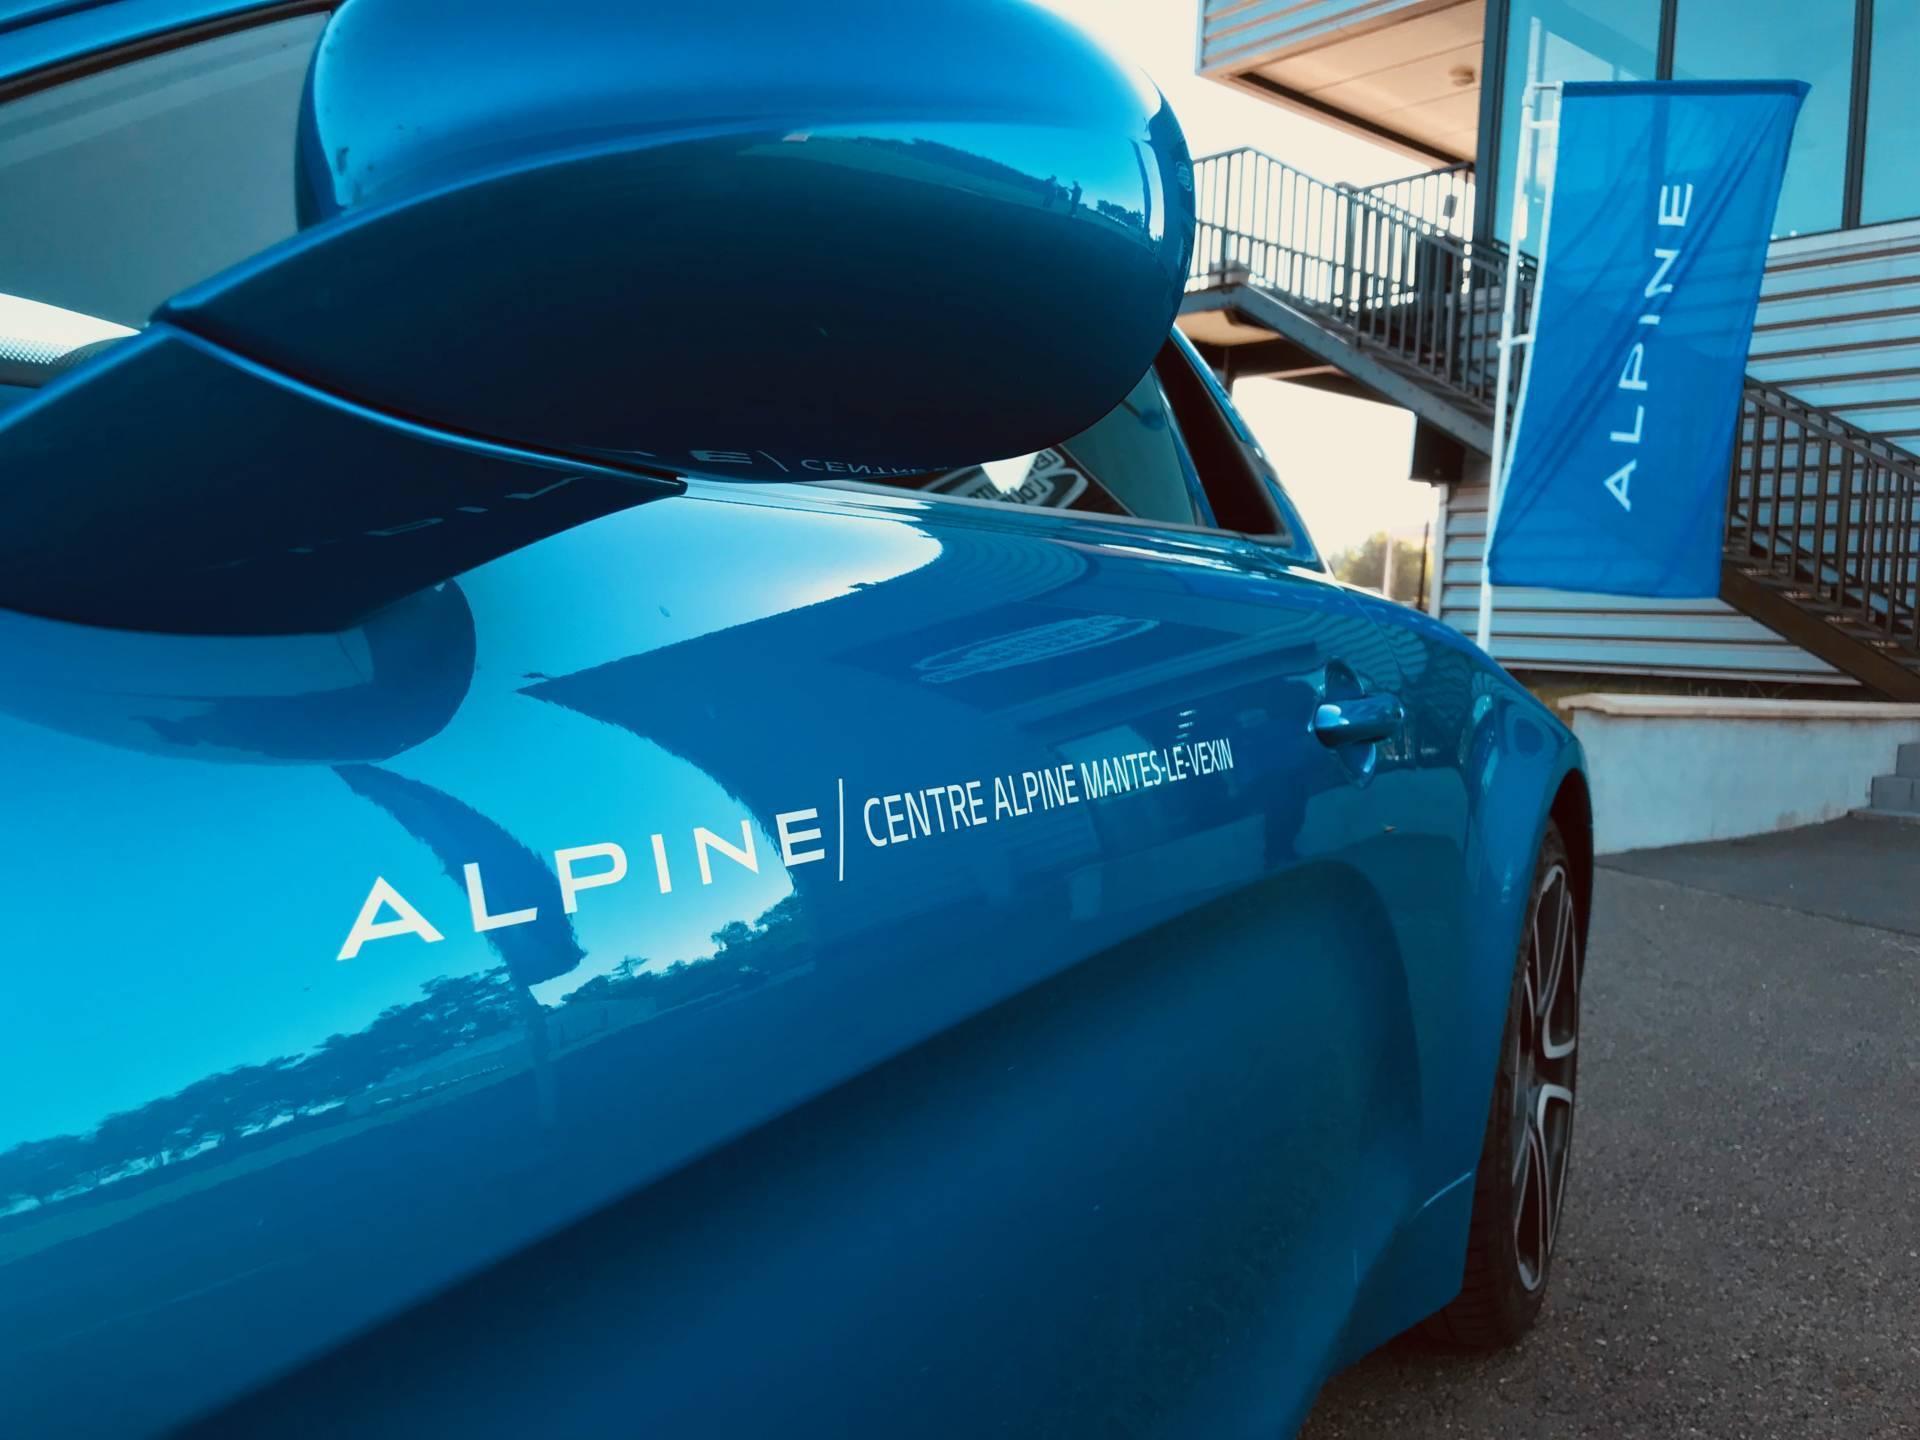 IMG 7626 1 - Centre Alpine Mantes le Vexin